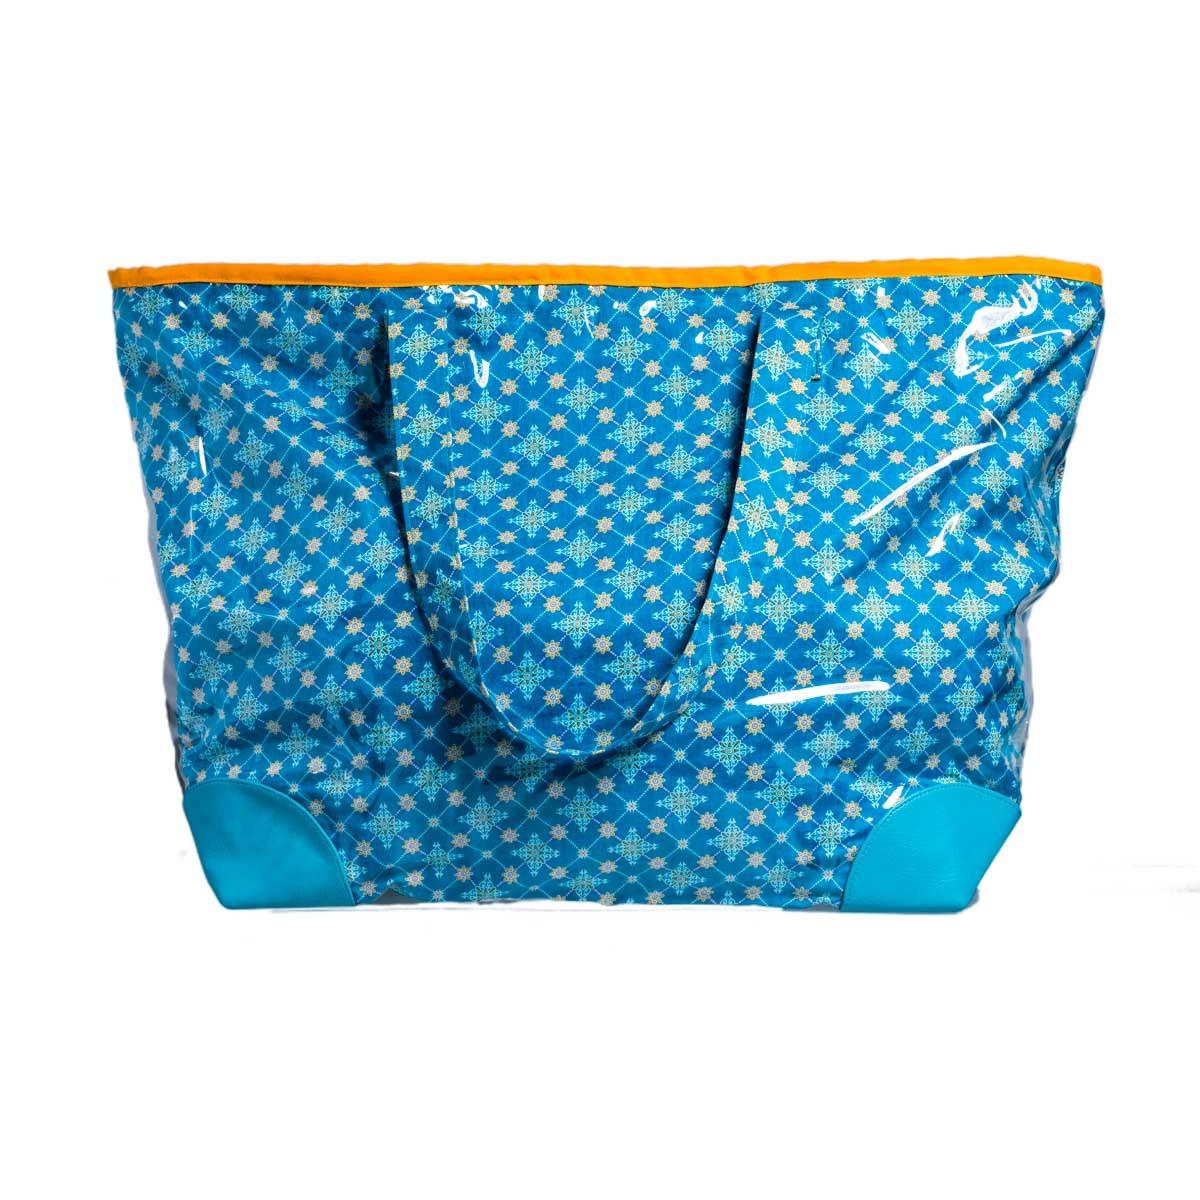 Grand sac cabas de plage tissu original et étanche bleu et jaune